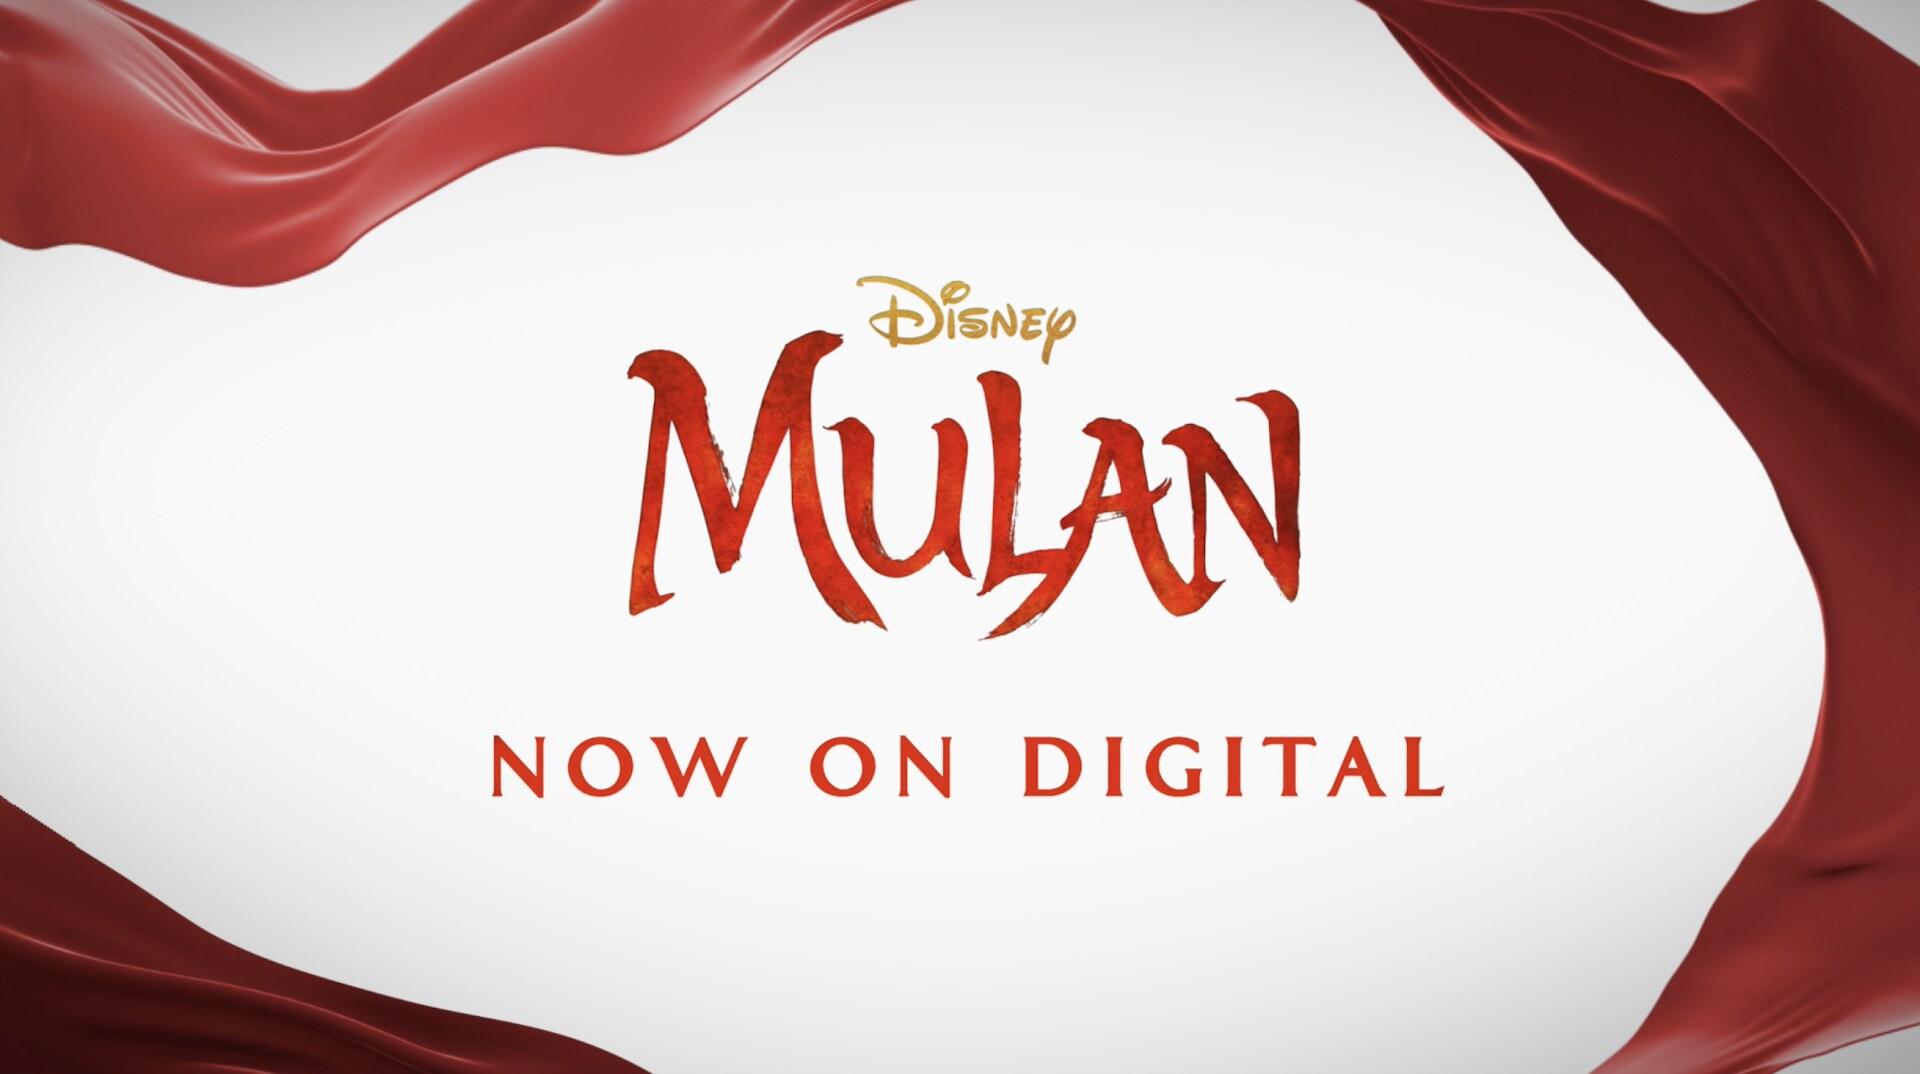 Disney's Mulan | Now on Digital